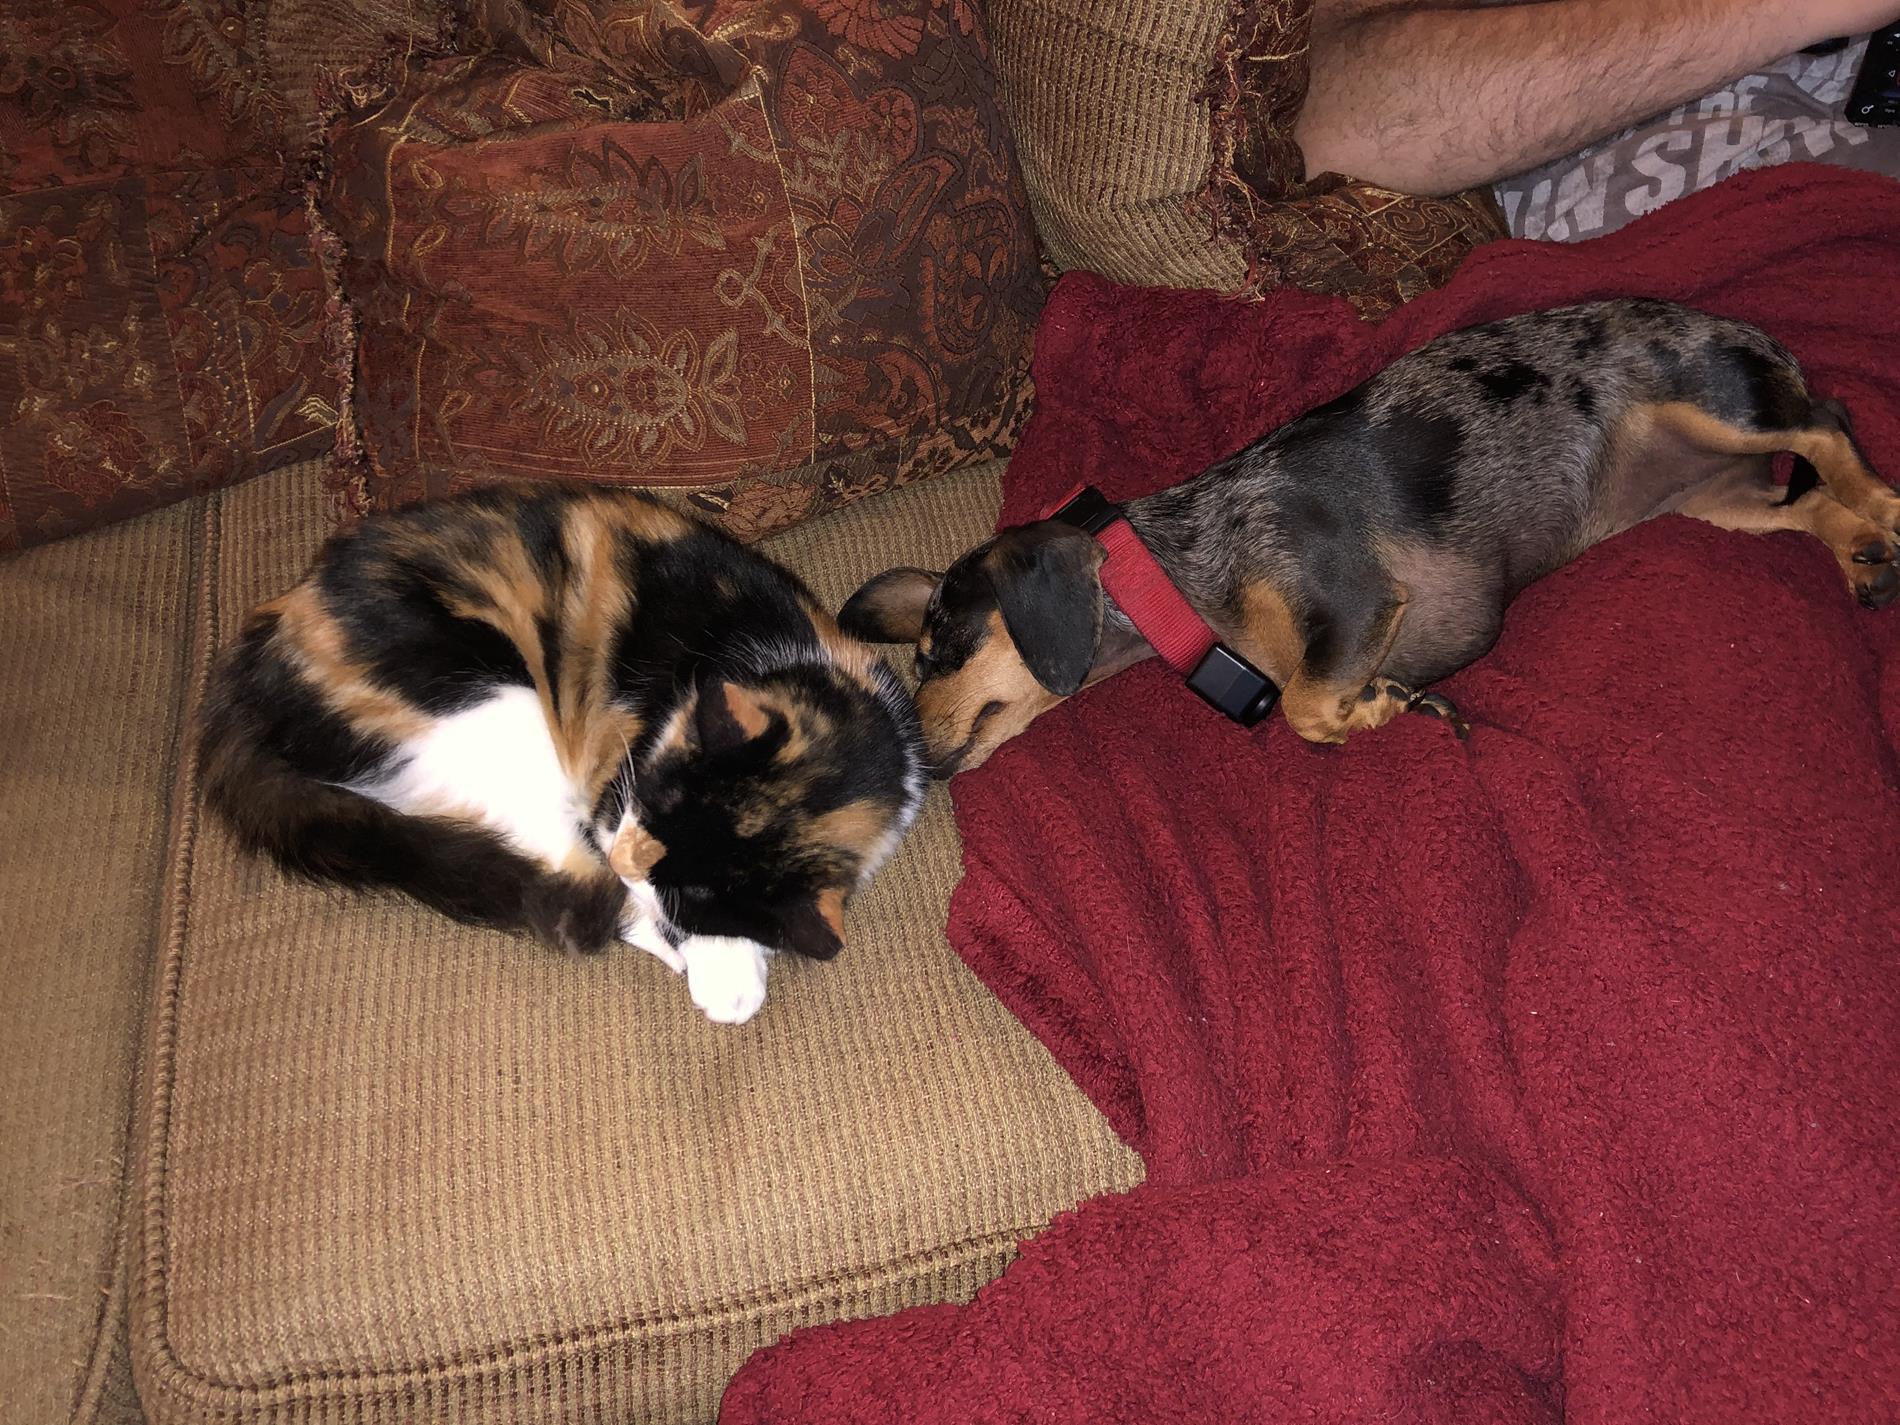 Callie and Dottie